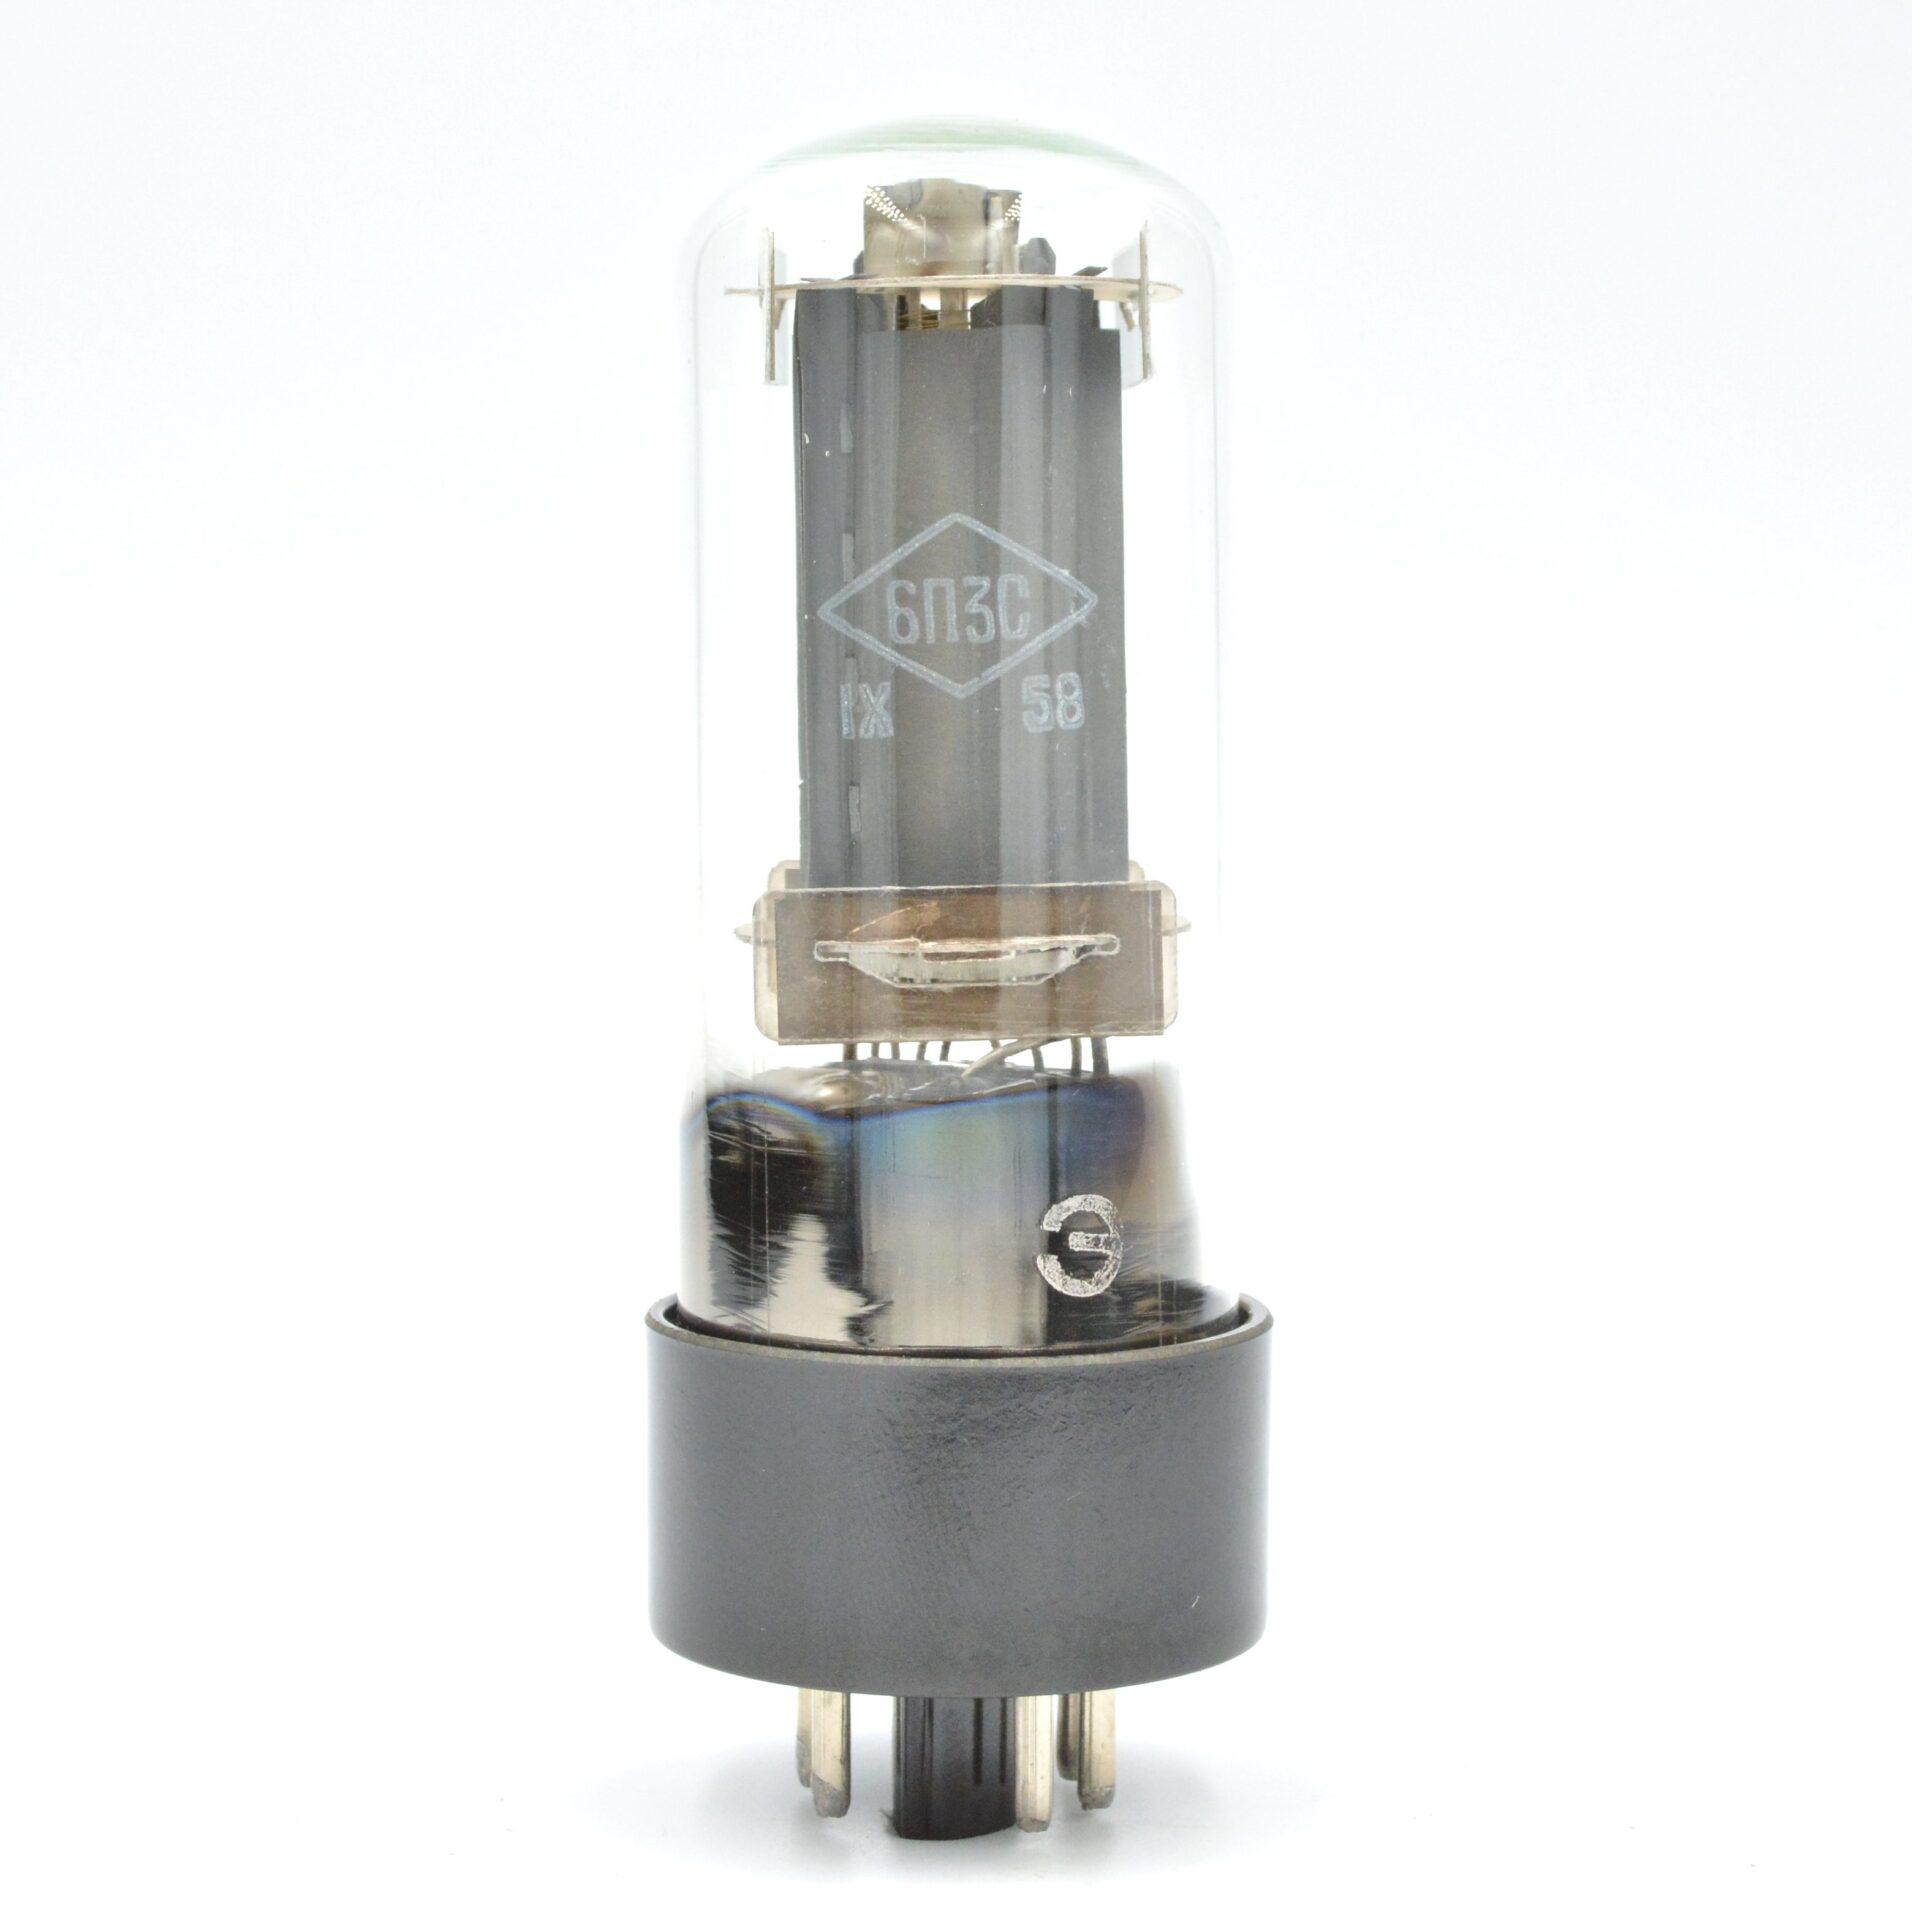 6N3C 6P3S 6L6GC 5881 Reflektor Power Tube